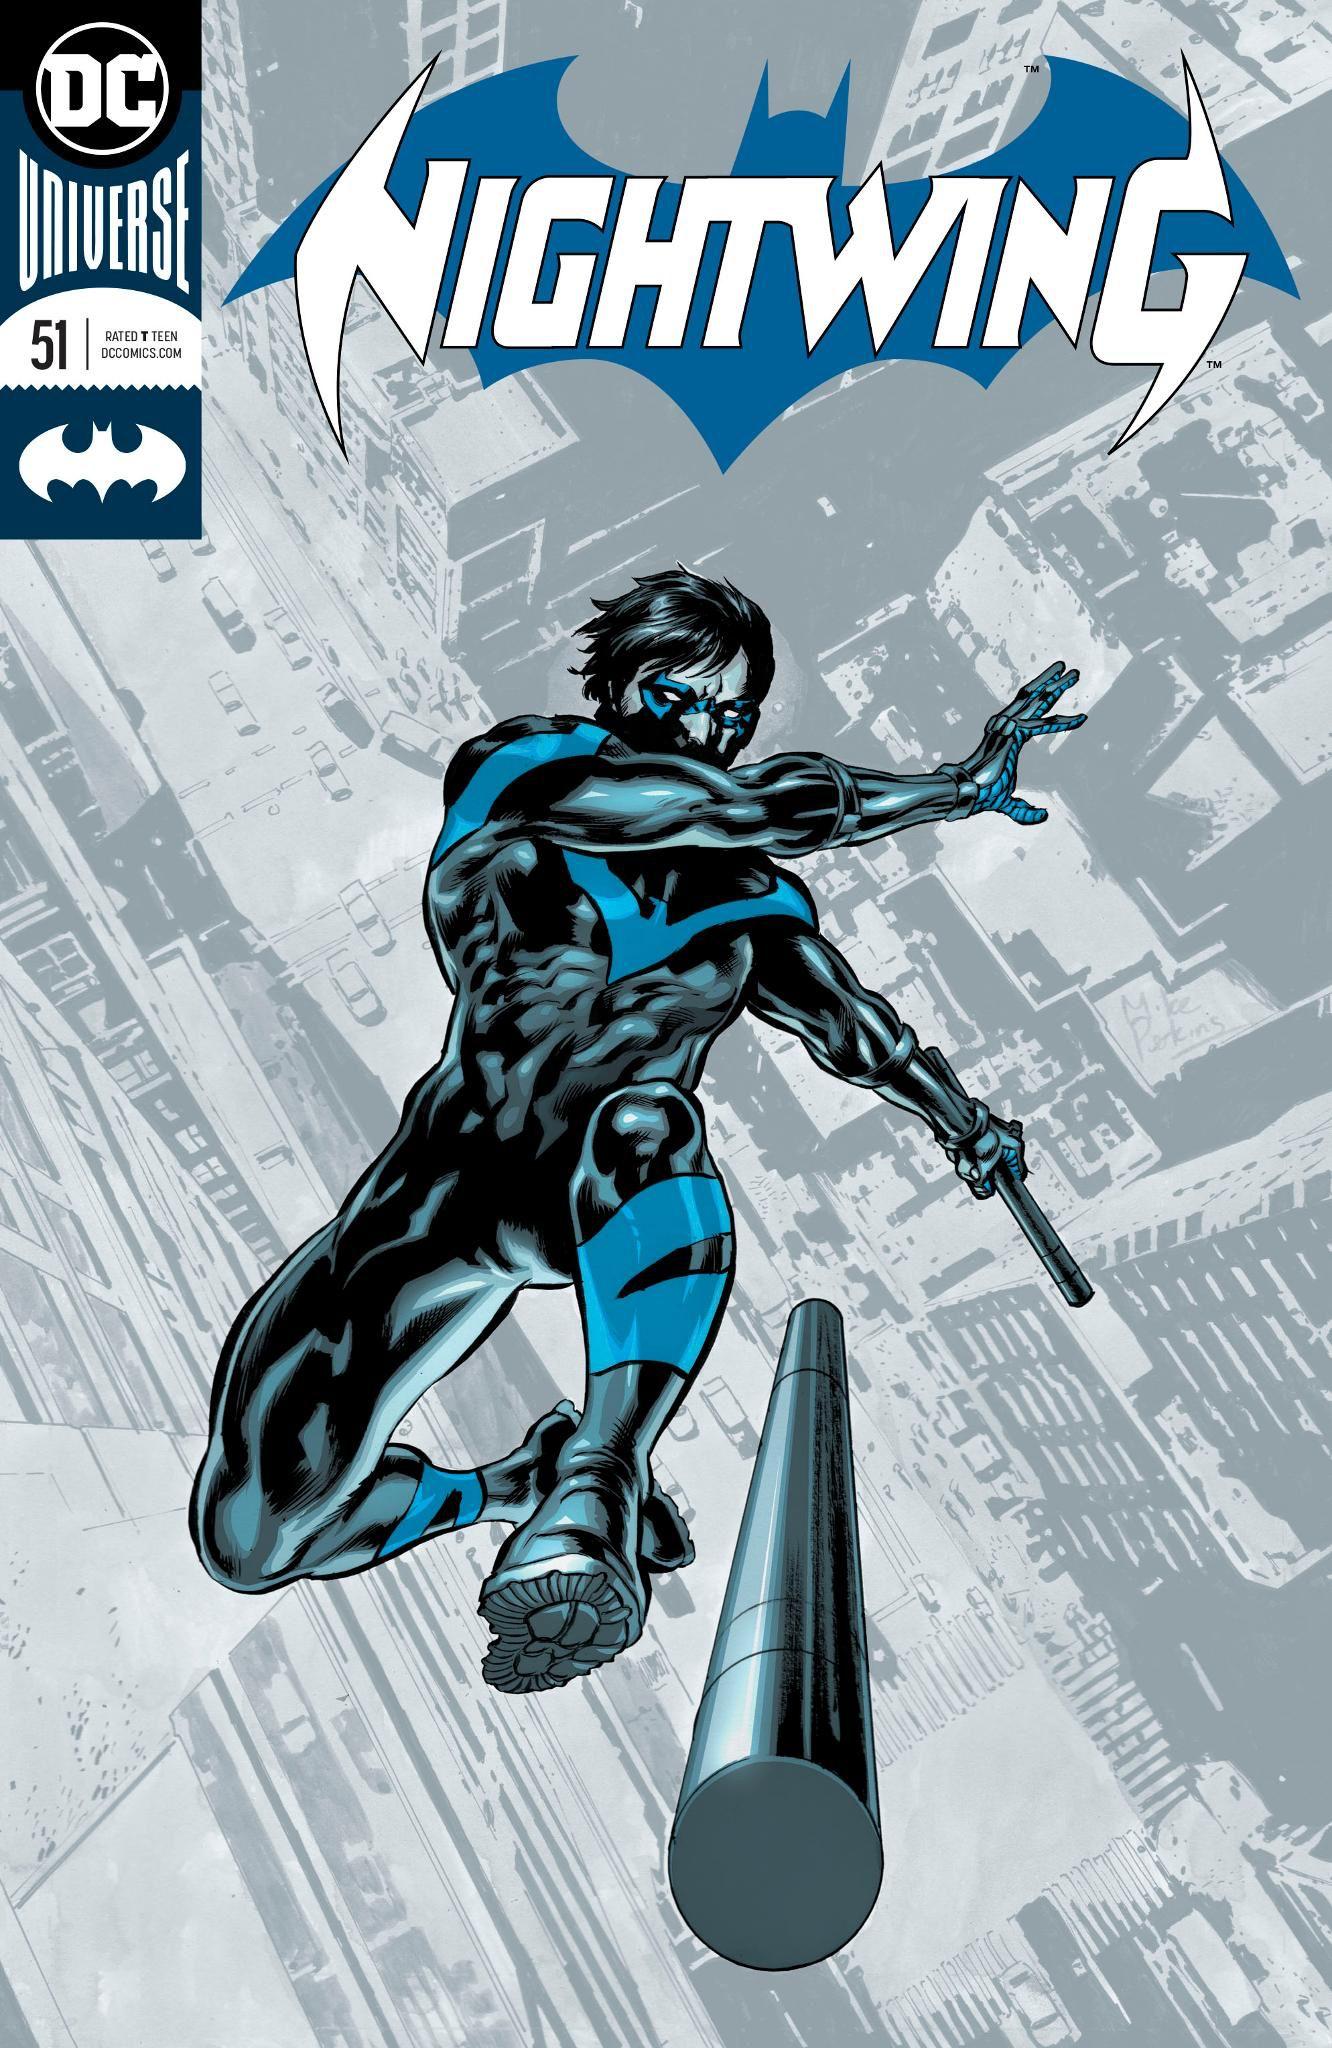 Pin by Shel Holmes on DC Universe Nightwing, Comics, Batman